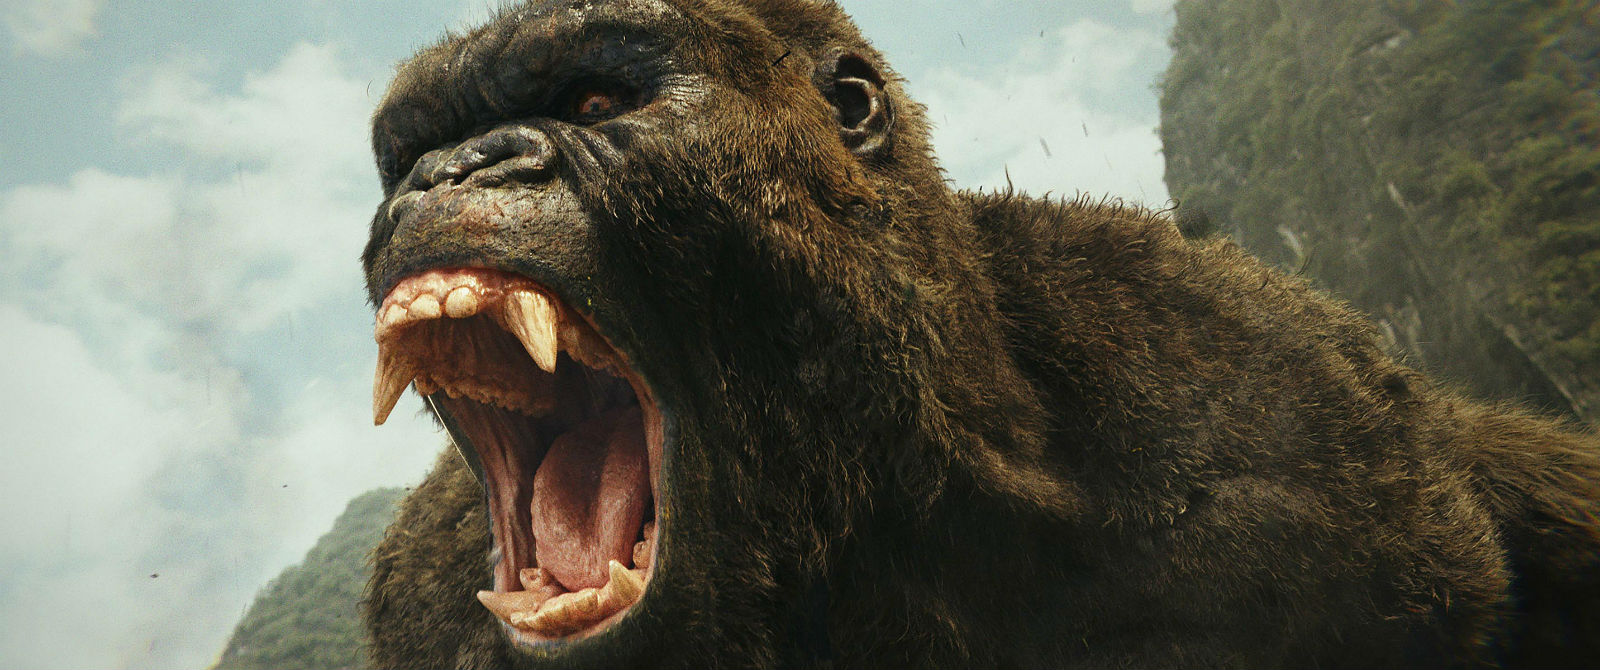 Kong: A Ilha da Caveira - Foto